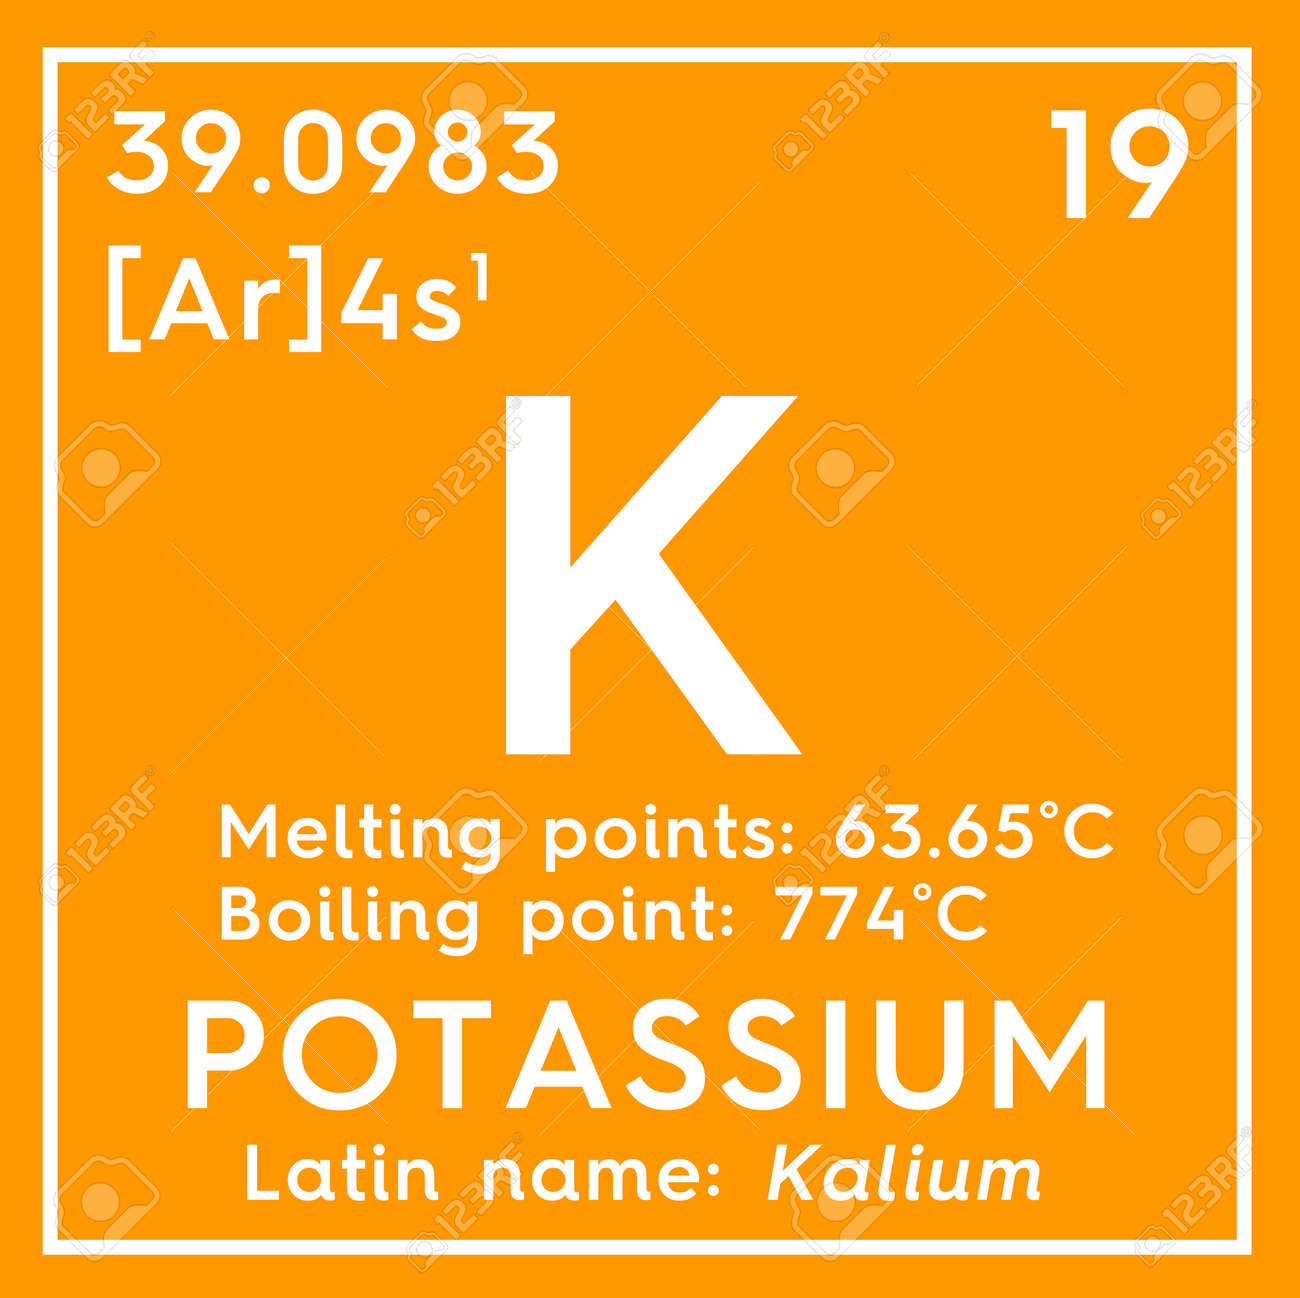 Potasio kalium metales alcalinos elemento qumico de la tabla foto de archivo potasio kalium metales alcalinos elemento qumico de la tabla peridica de mendeleev urtaz Gallery